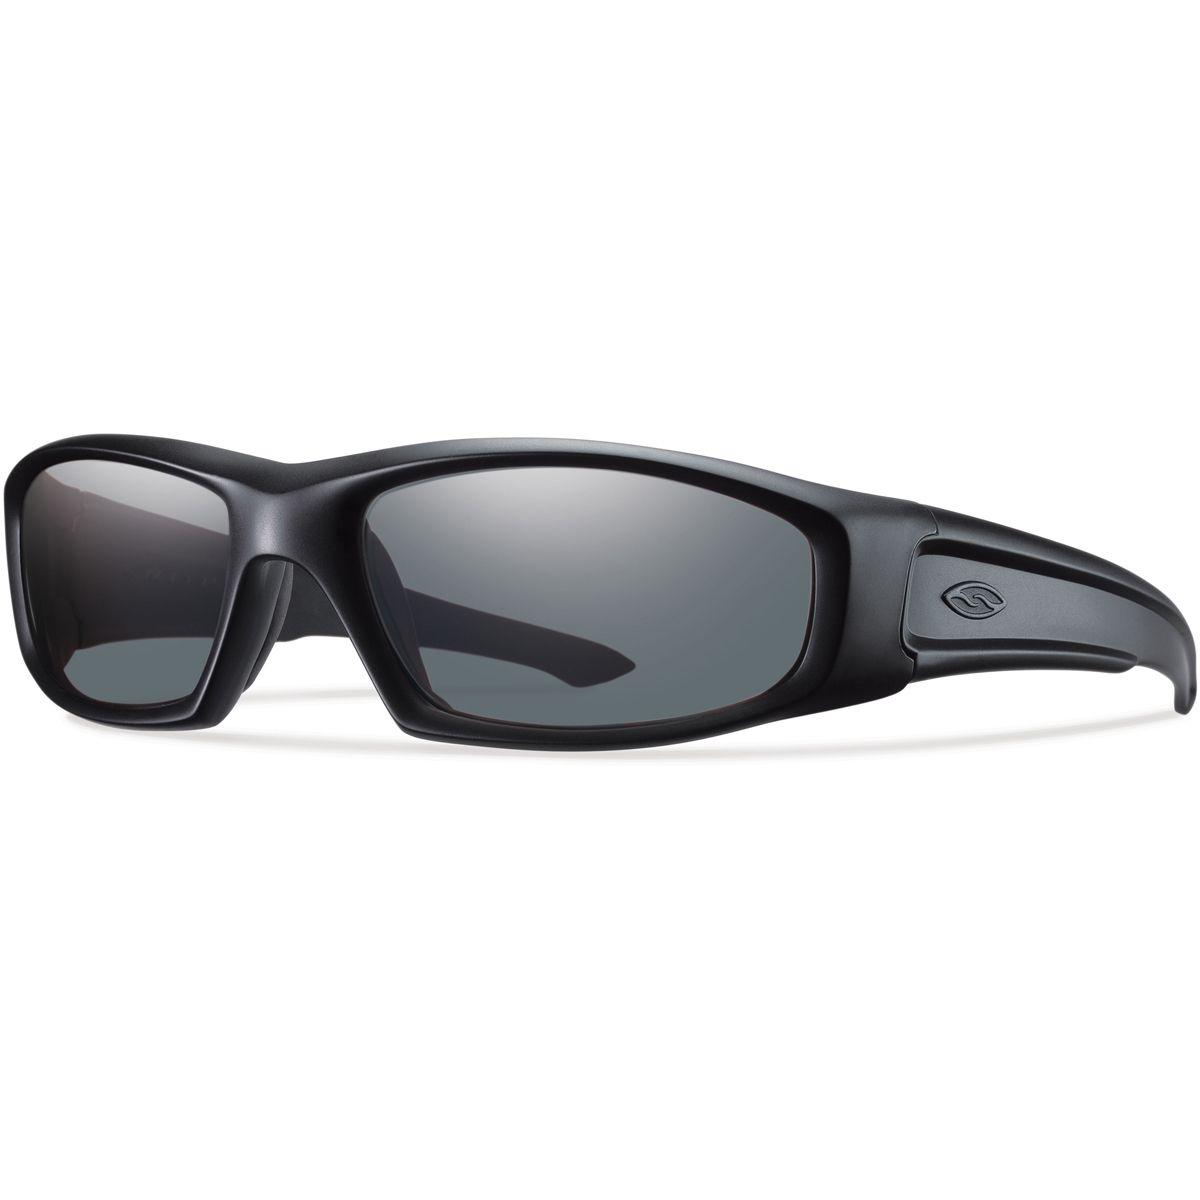 46aa0179cf36b SOS Eyewear Australia - Smith Optics Hudson Elite